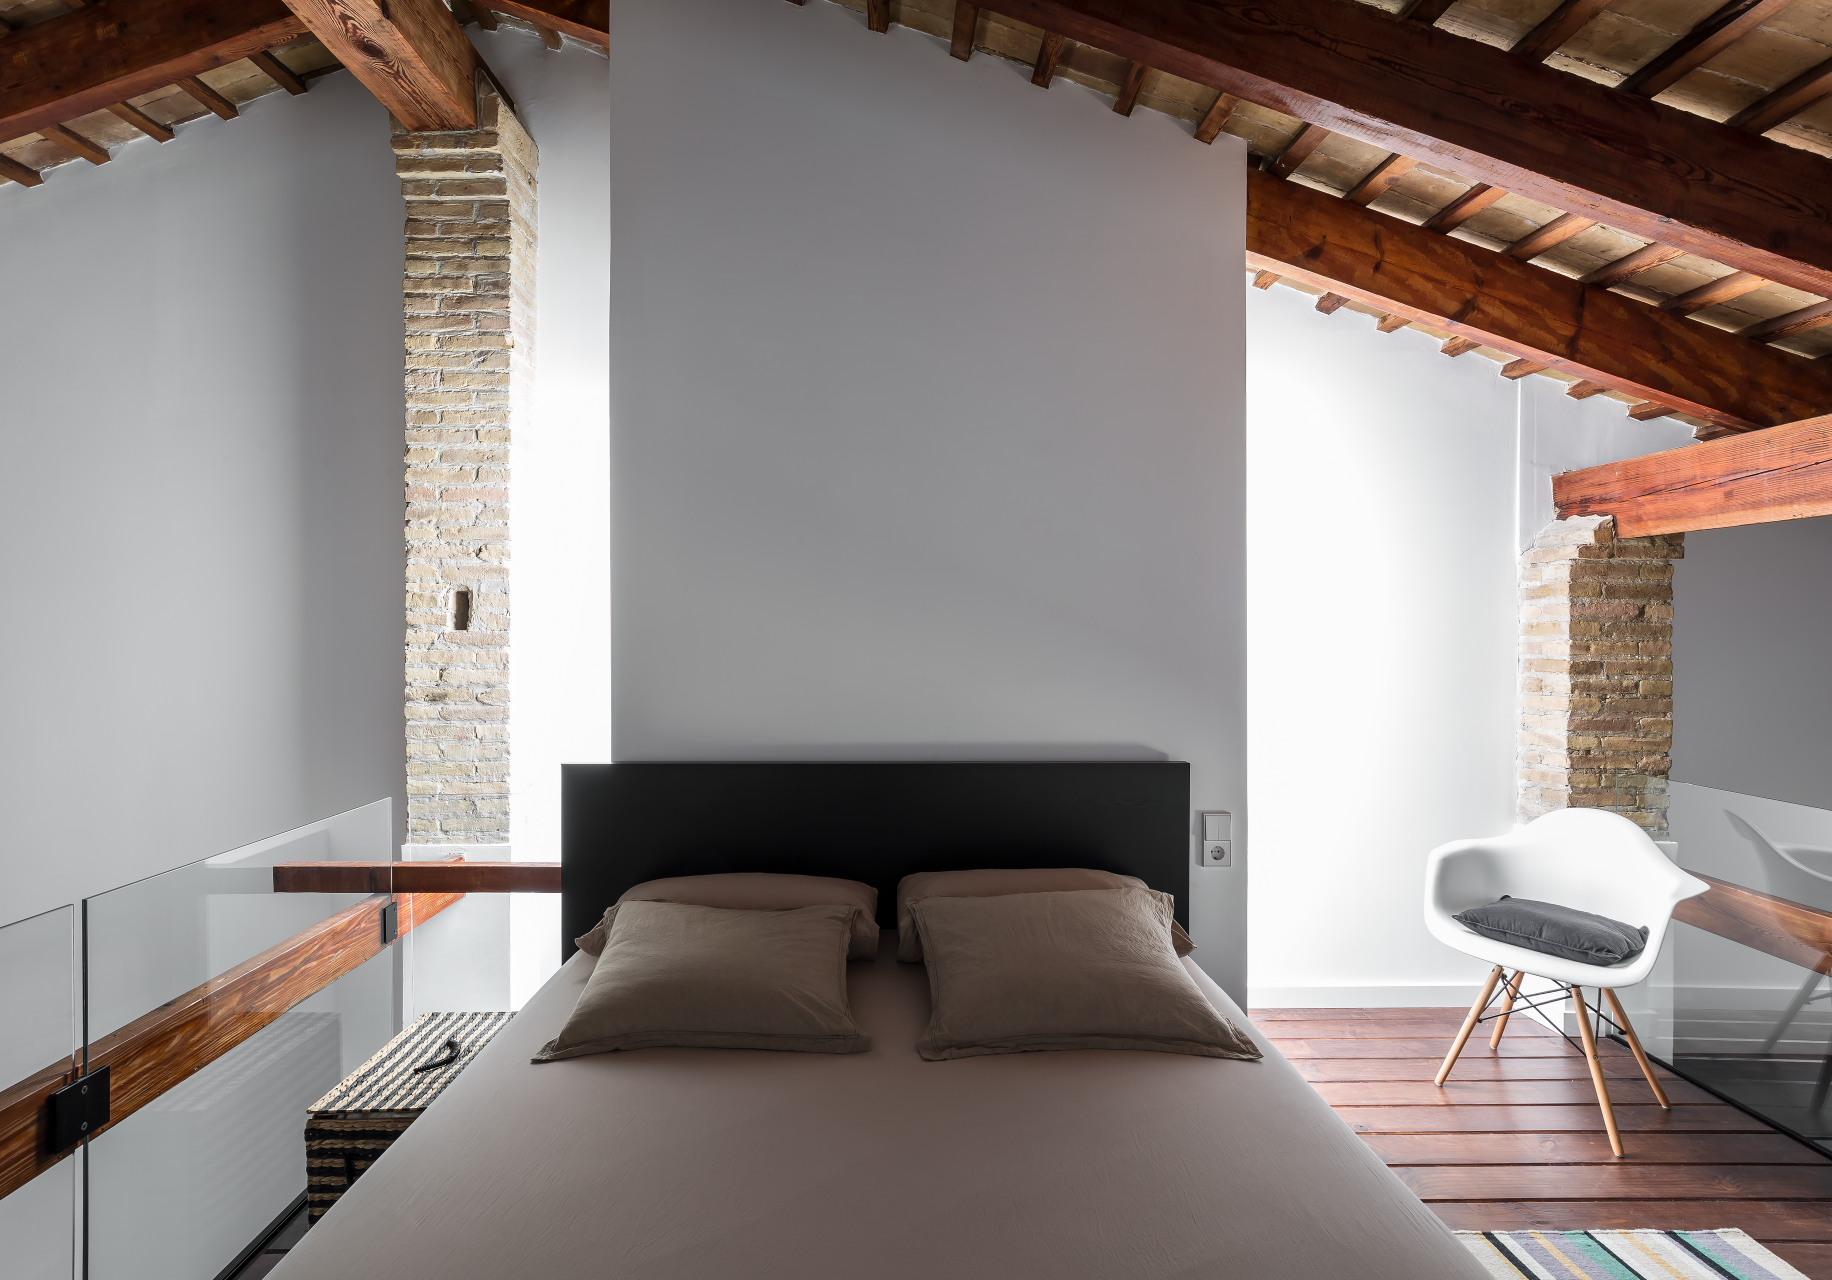 fotografia-arquitectura-valencia-german-cabo-ambau-cabanyal (23)